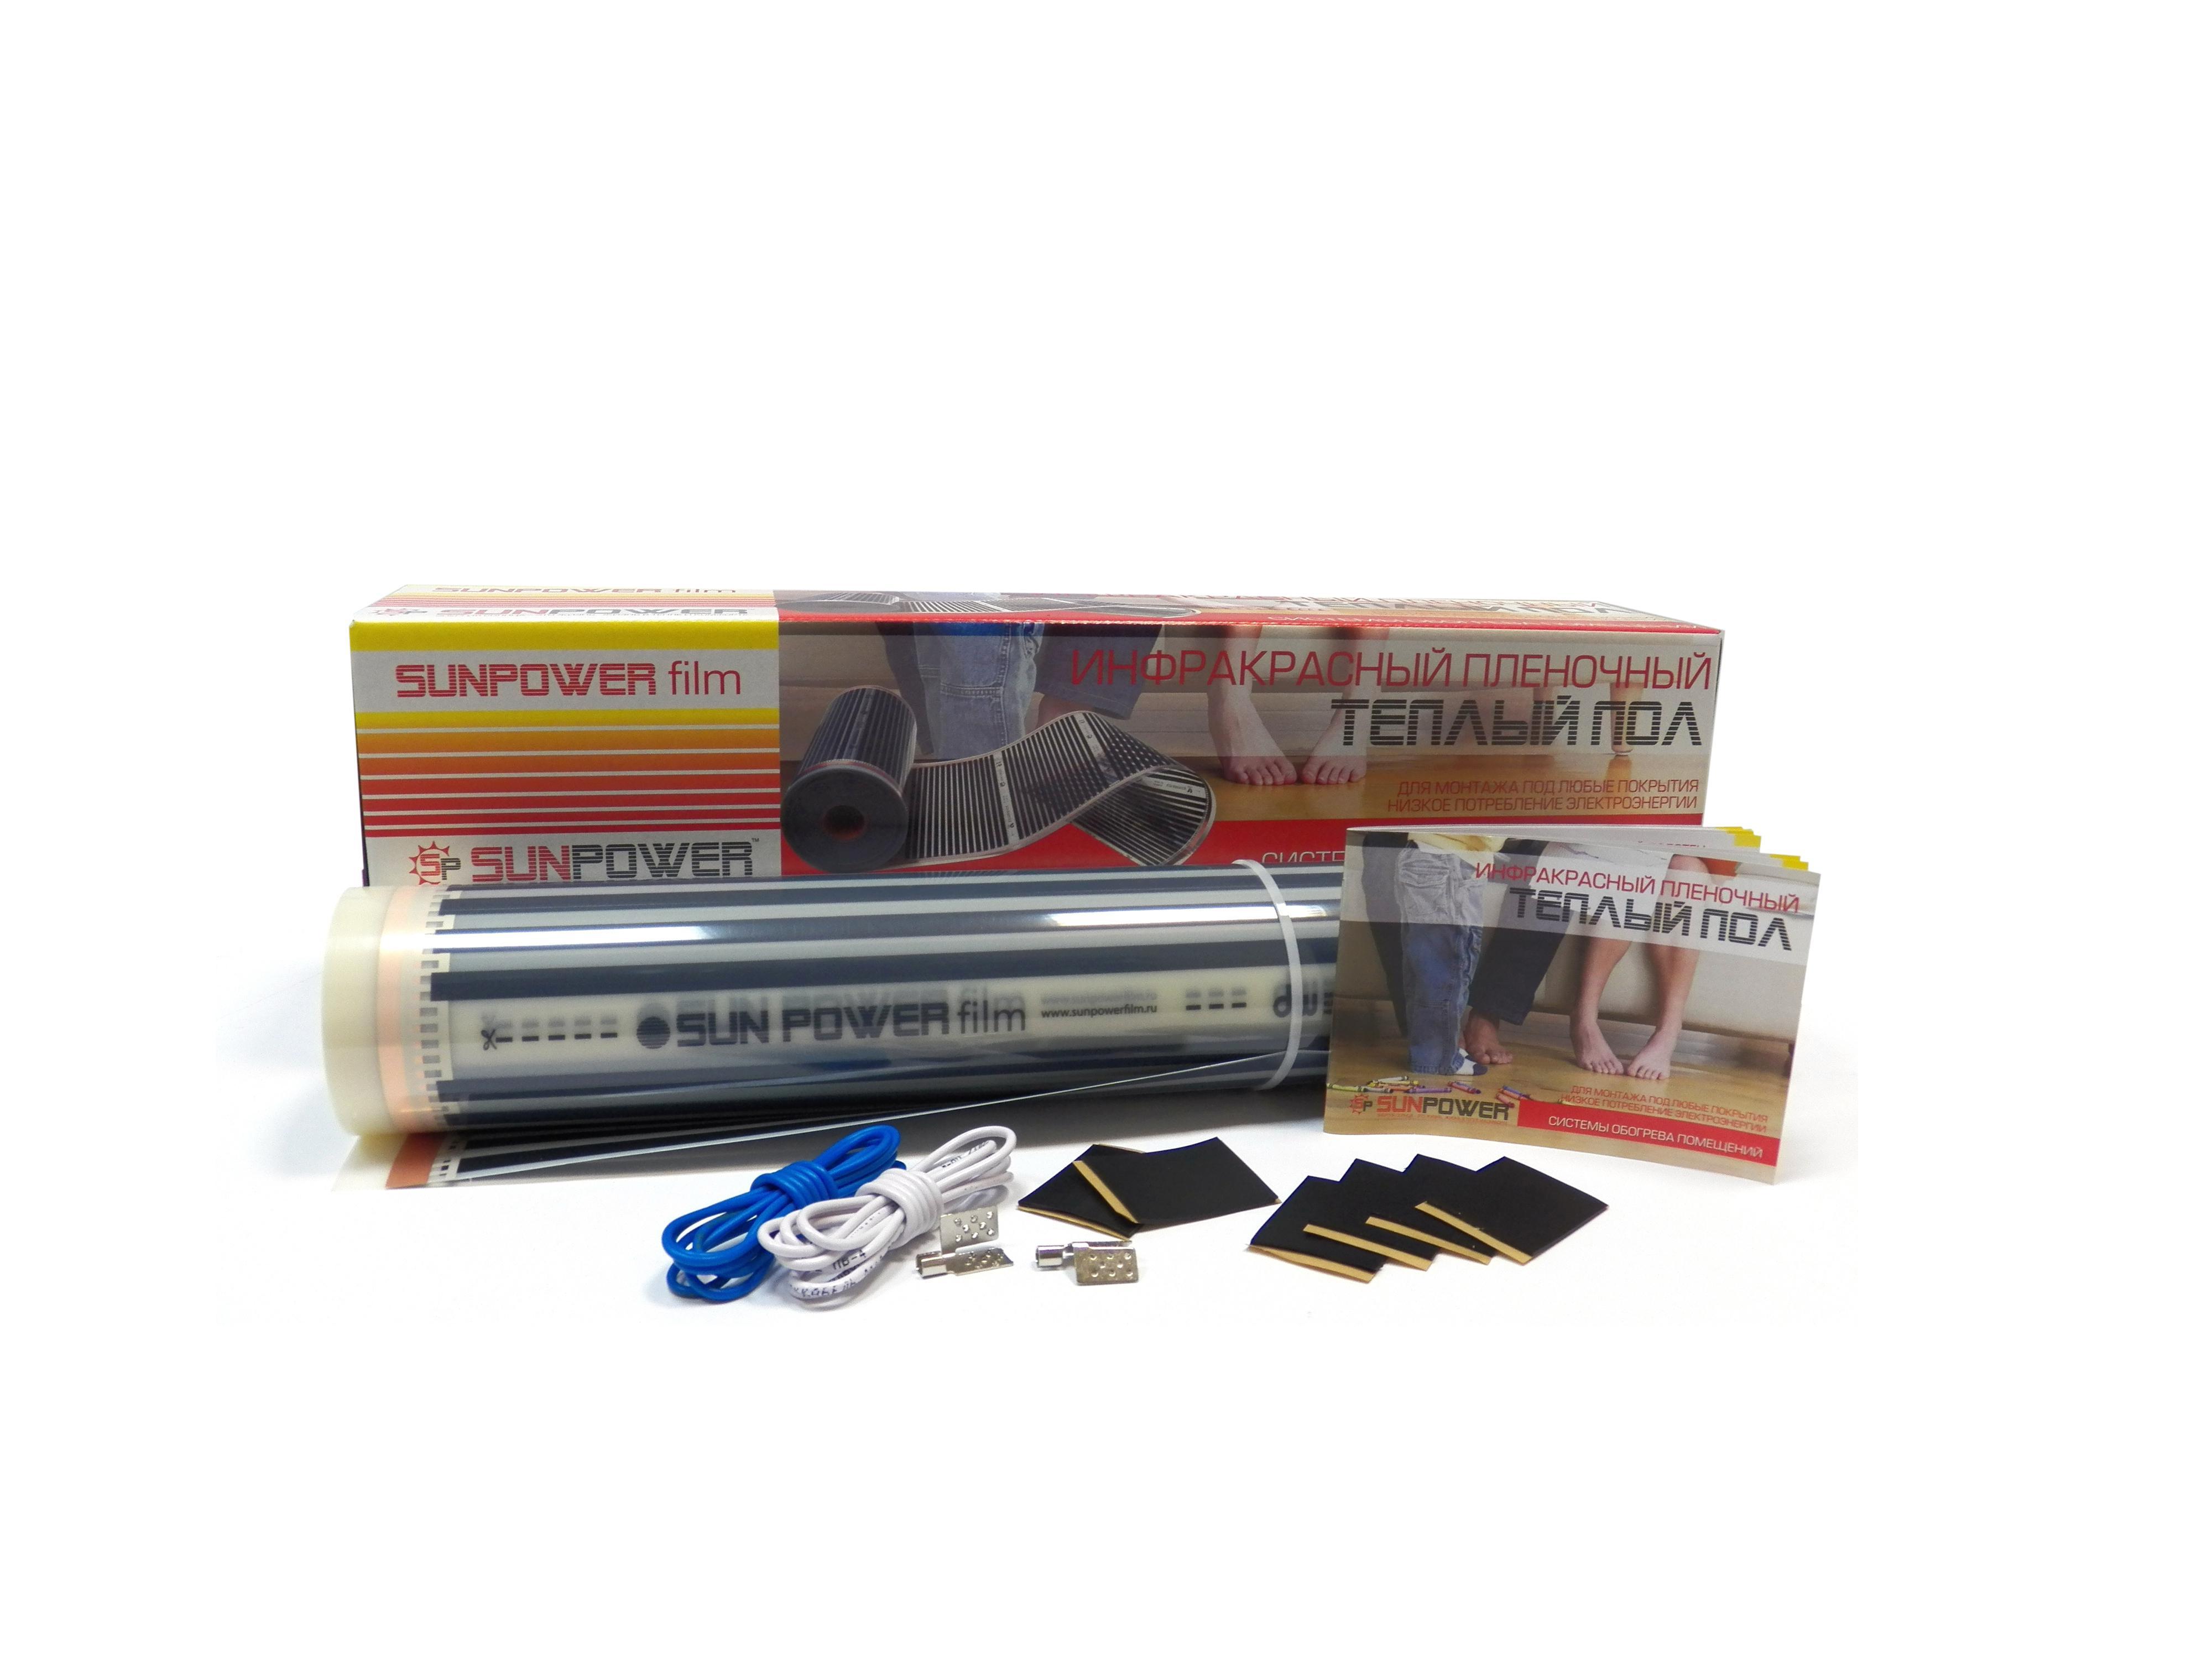 Теплый пол Sun power Spf 50-180-3 цена